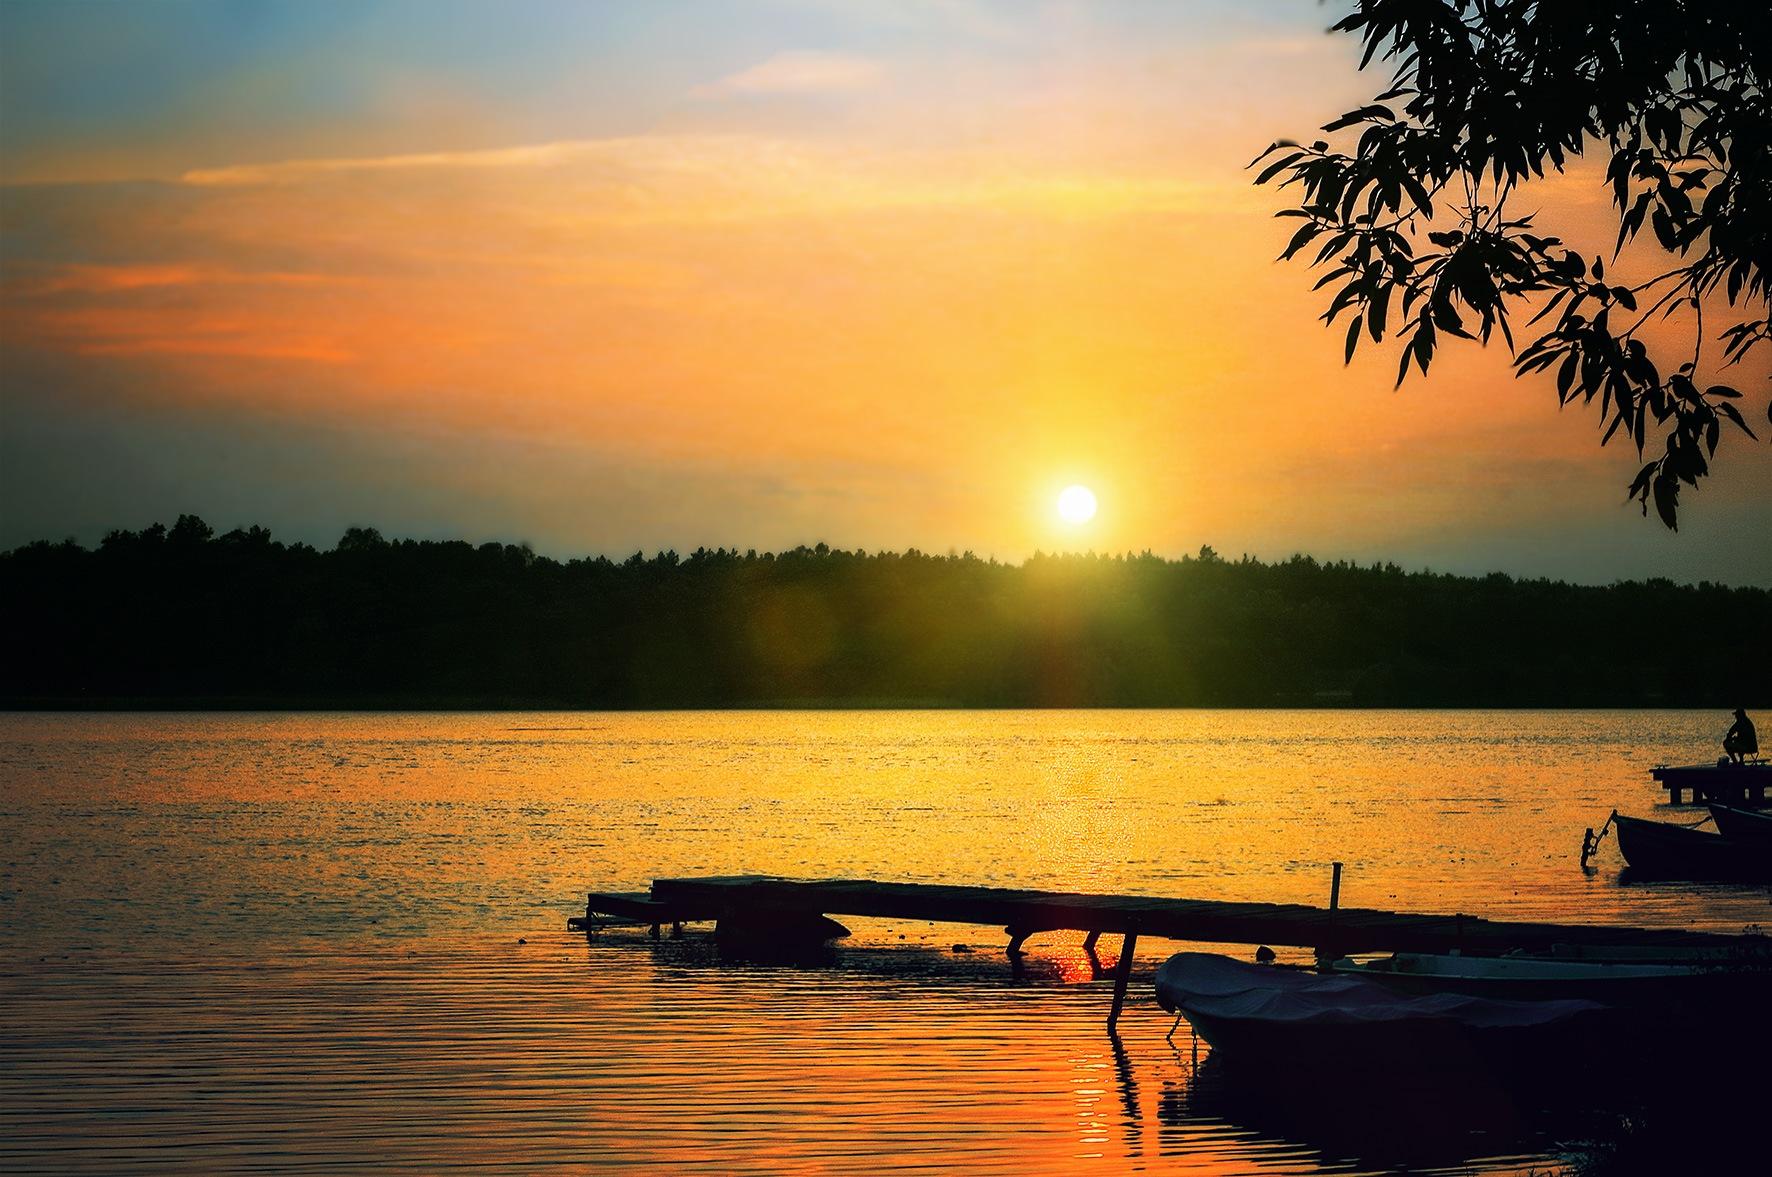 sunset by Tomasz Marciniak